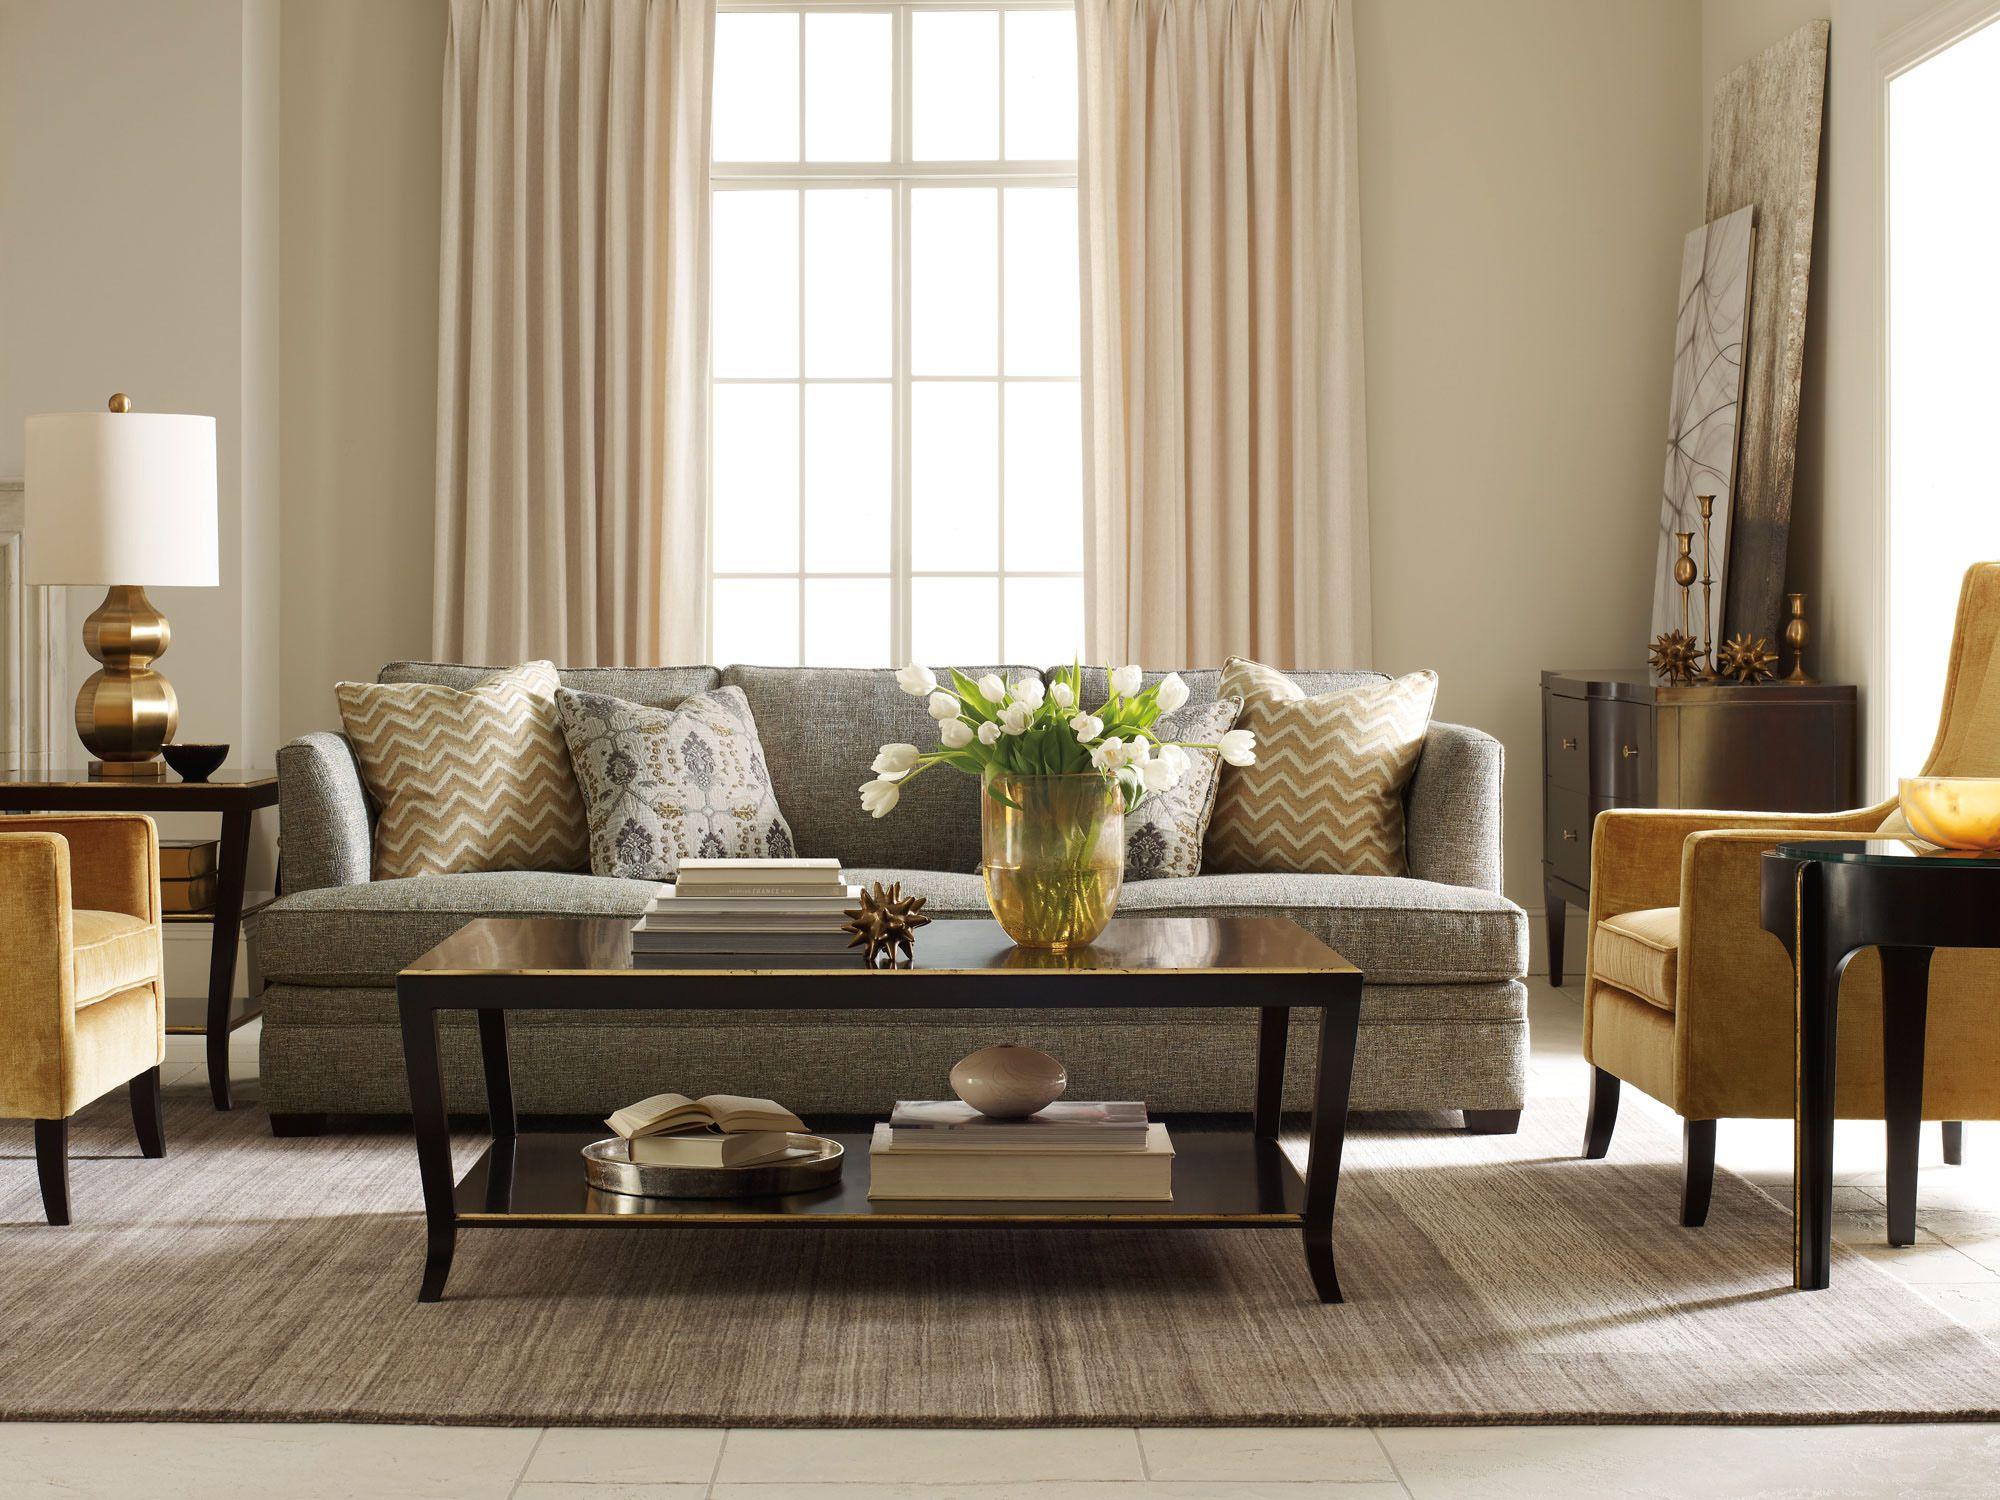 Bernhardt Living Room Furniture. Living Room Furniture at Sheffield  Interiors Grantham Conway Mayfair Bernhardt Eriks like the